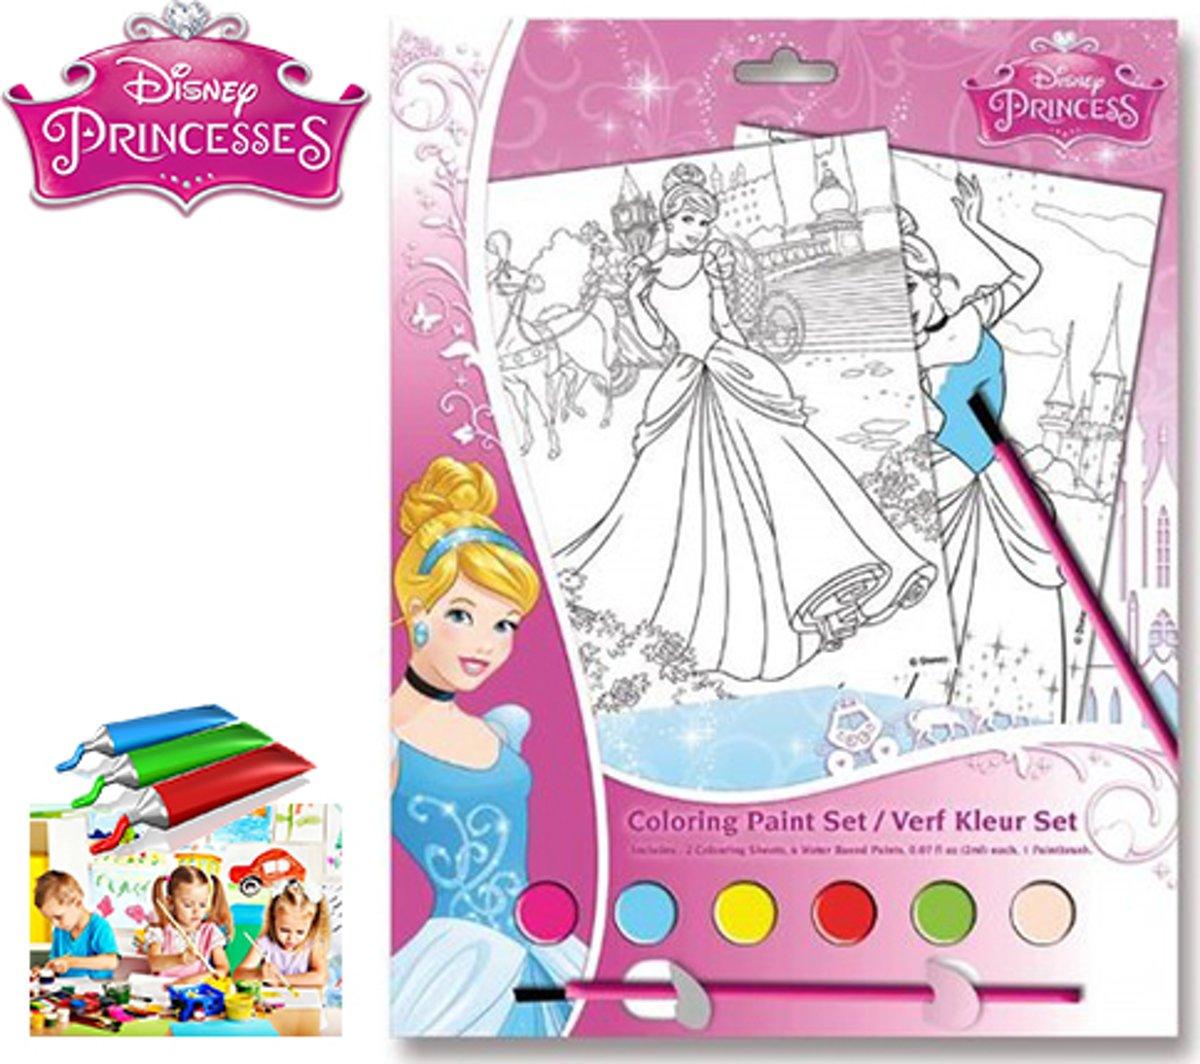 Disney Princess Verf Kleur Set - Inclusief 6 Potjes Verf + 1 Kwast kopen